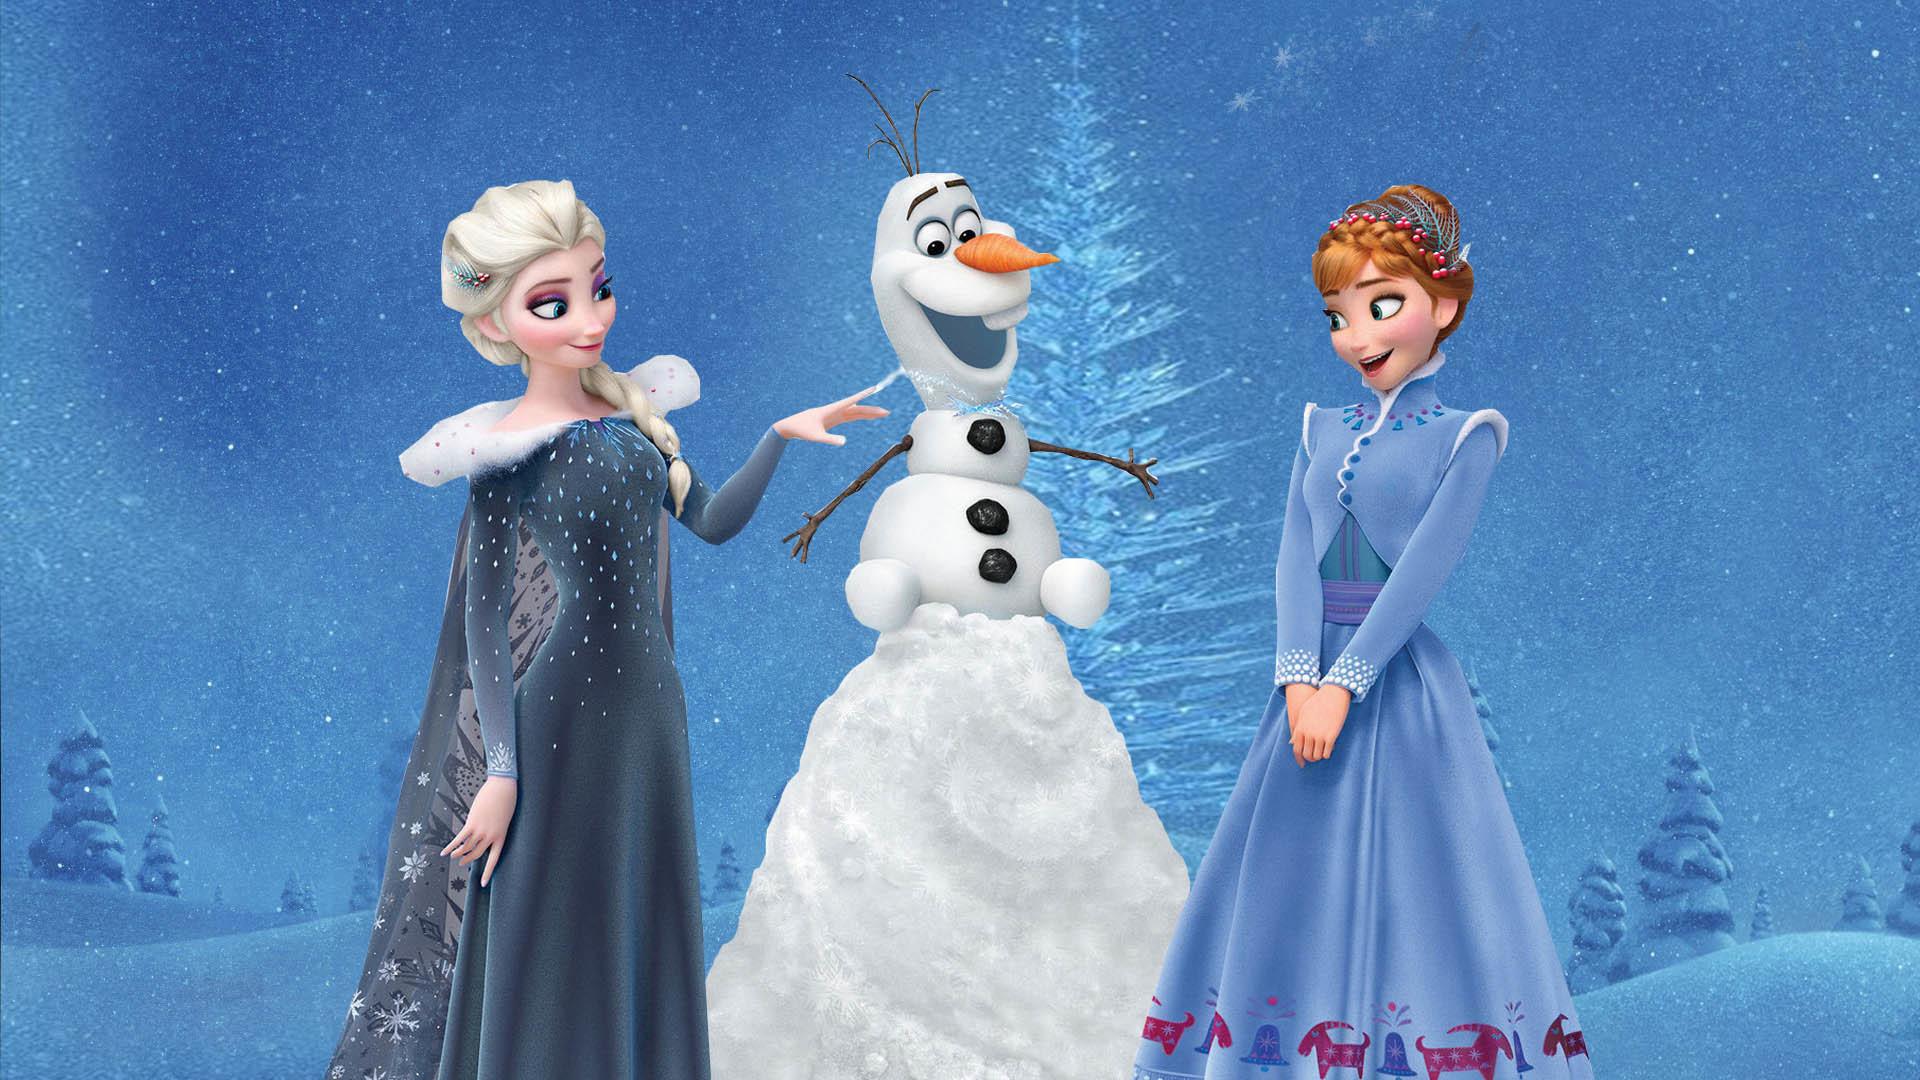 Olafs Frozen Adventure Anna And Elsa Princess 2017 Wallpaper